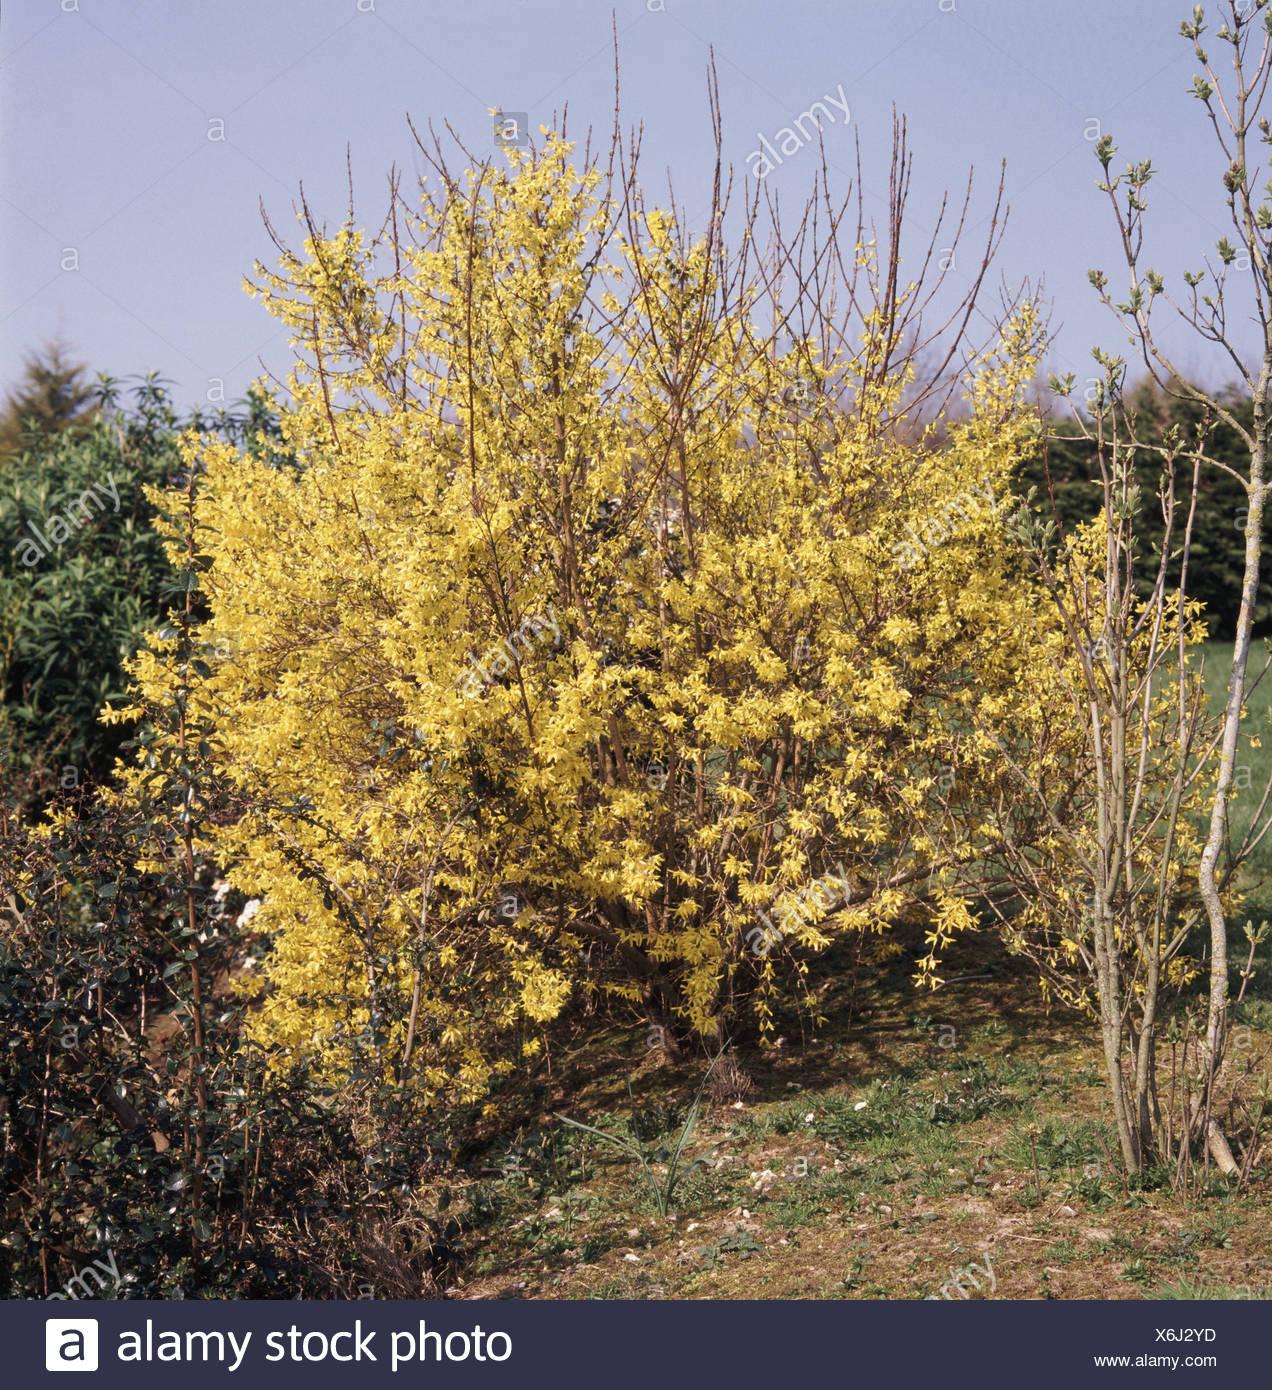 Yellow early flowering Forsythia shrub in garden setting Stock Photo